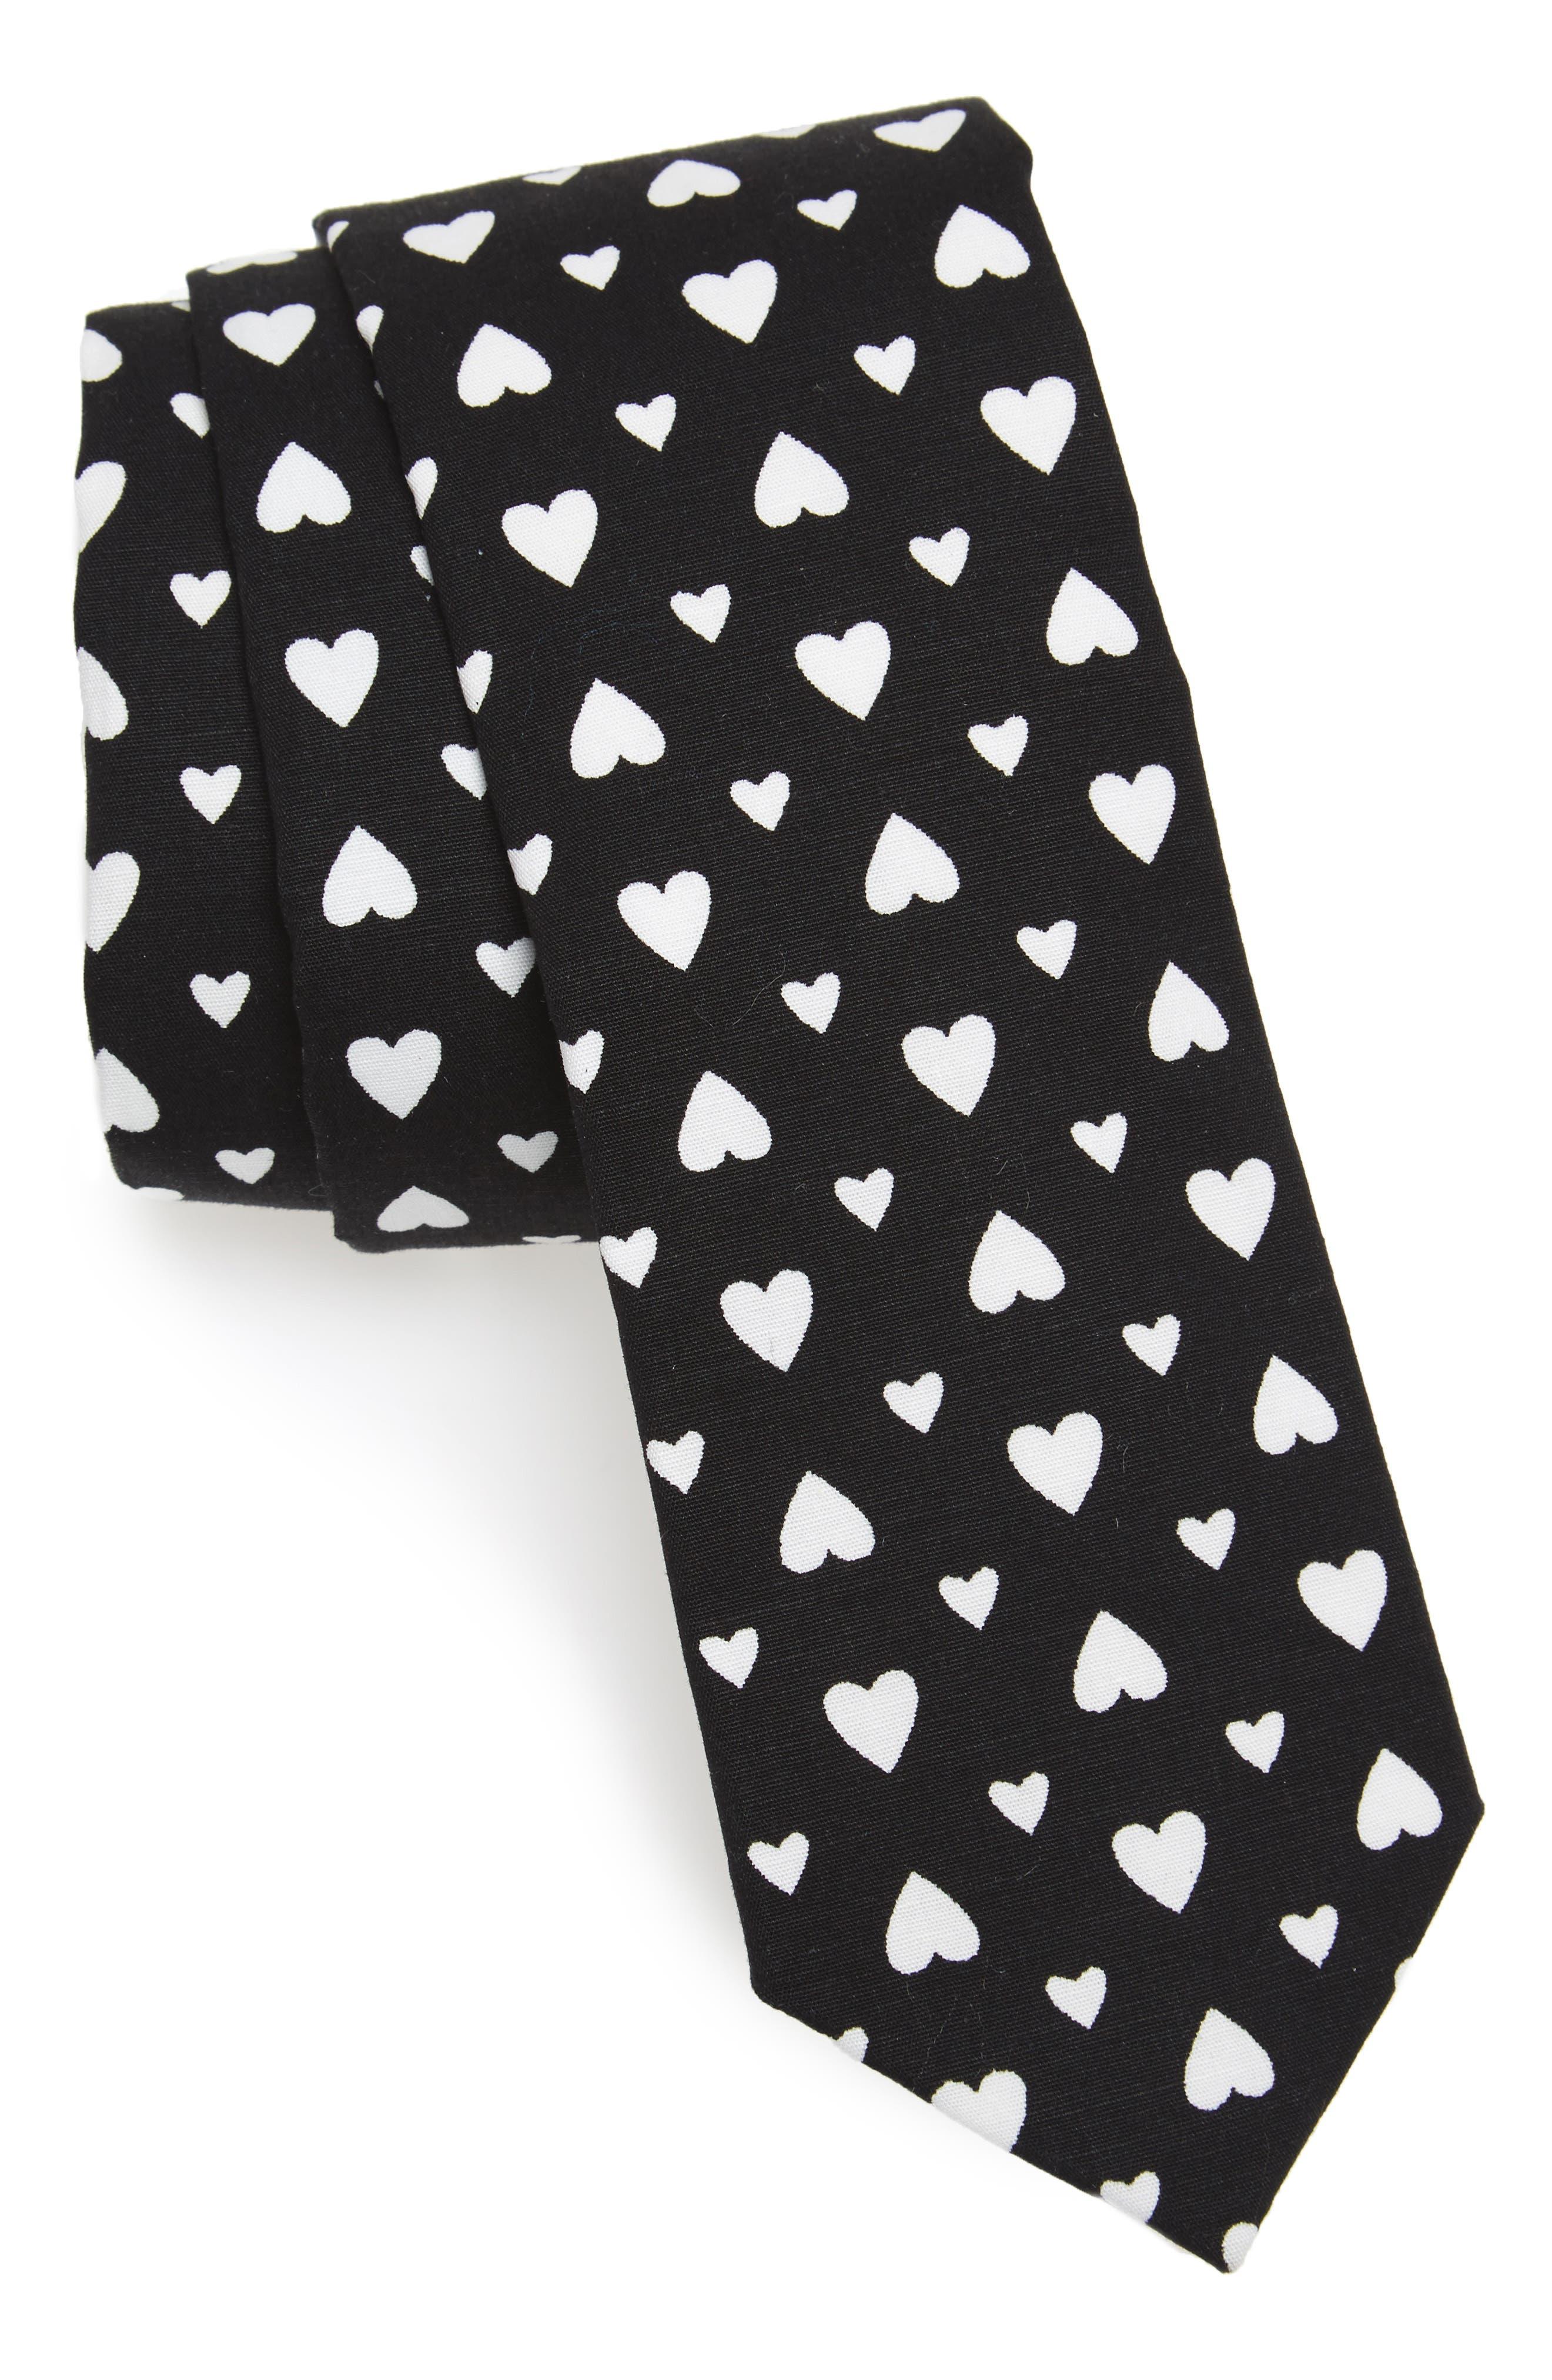 Main Image - 1901 Hearts Print Skinny Tie